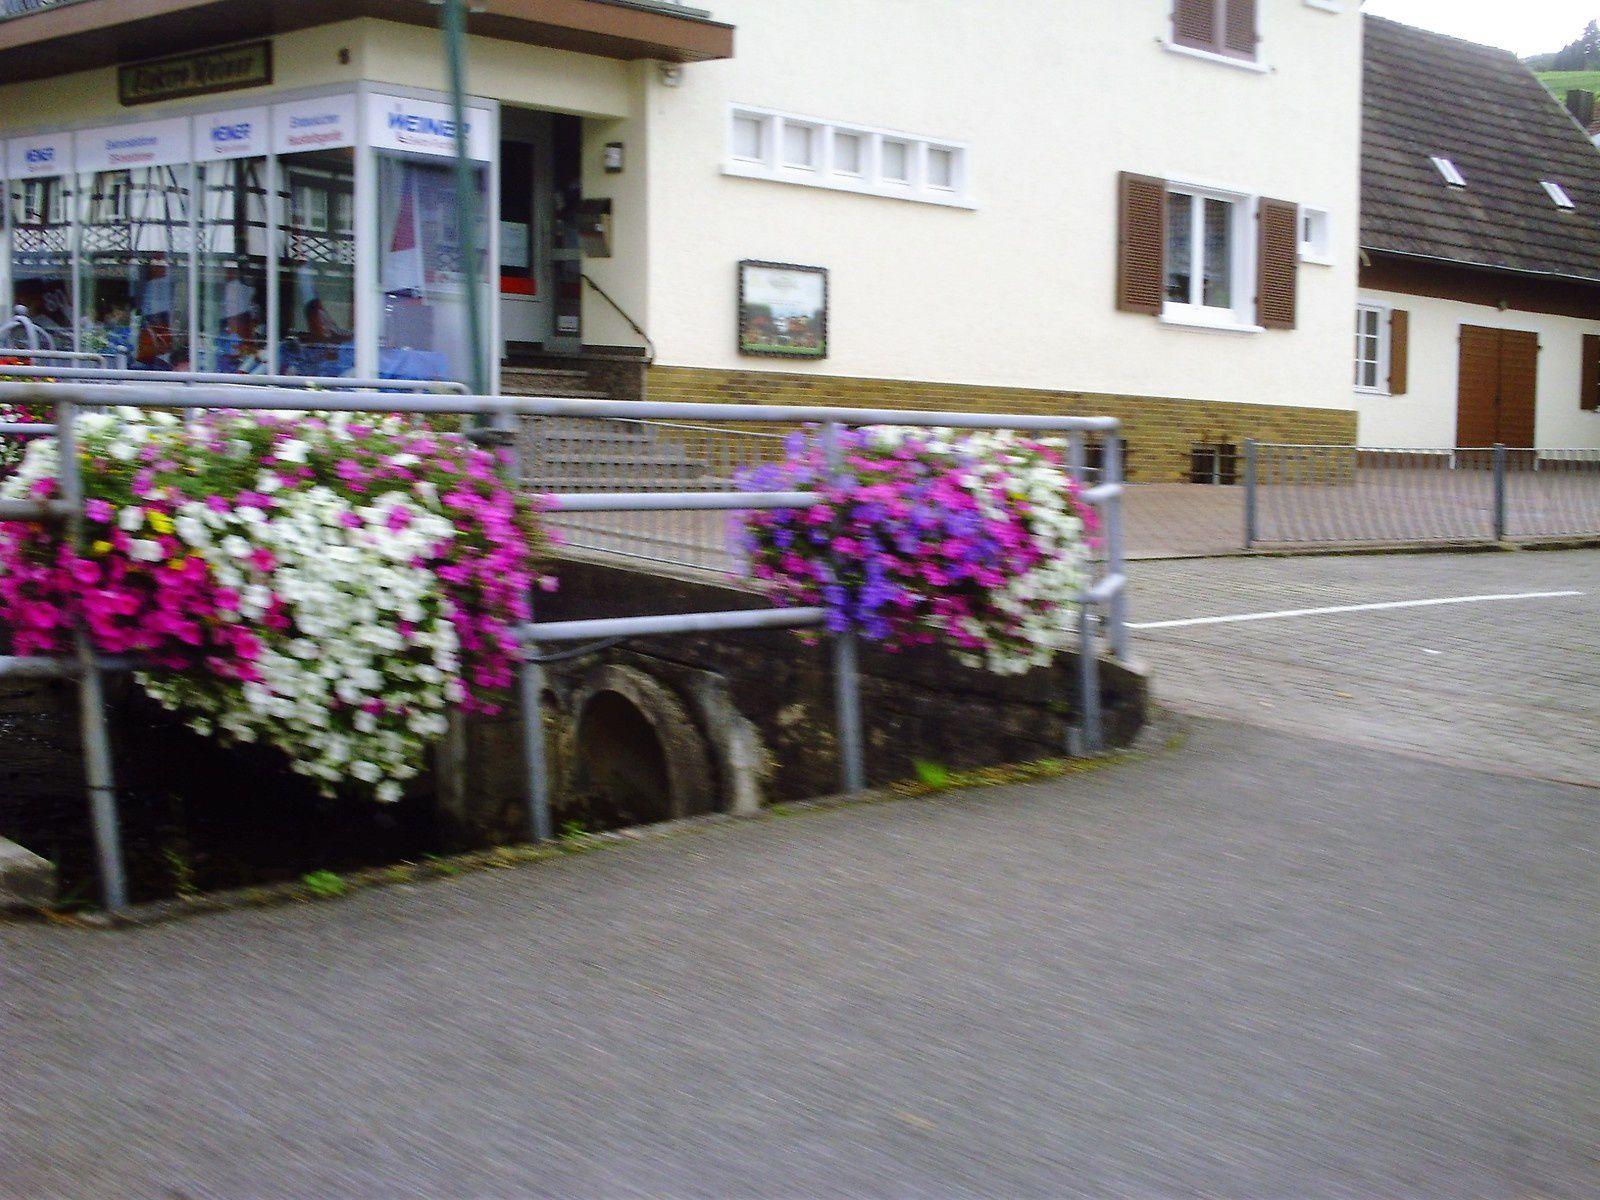 JOLI VILLAGE DURBACH